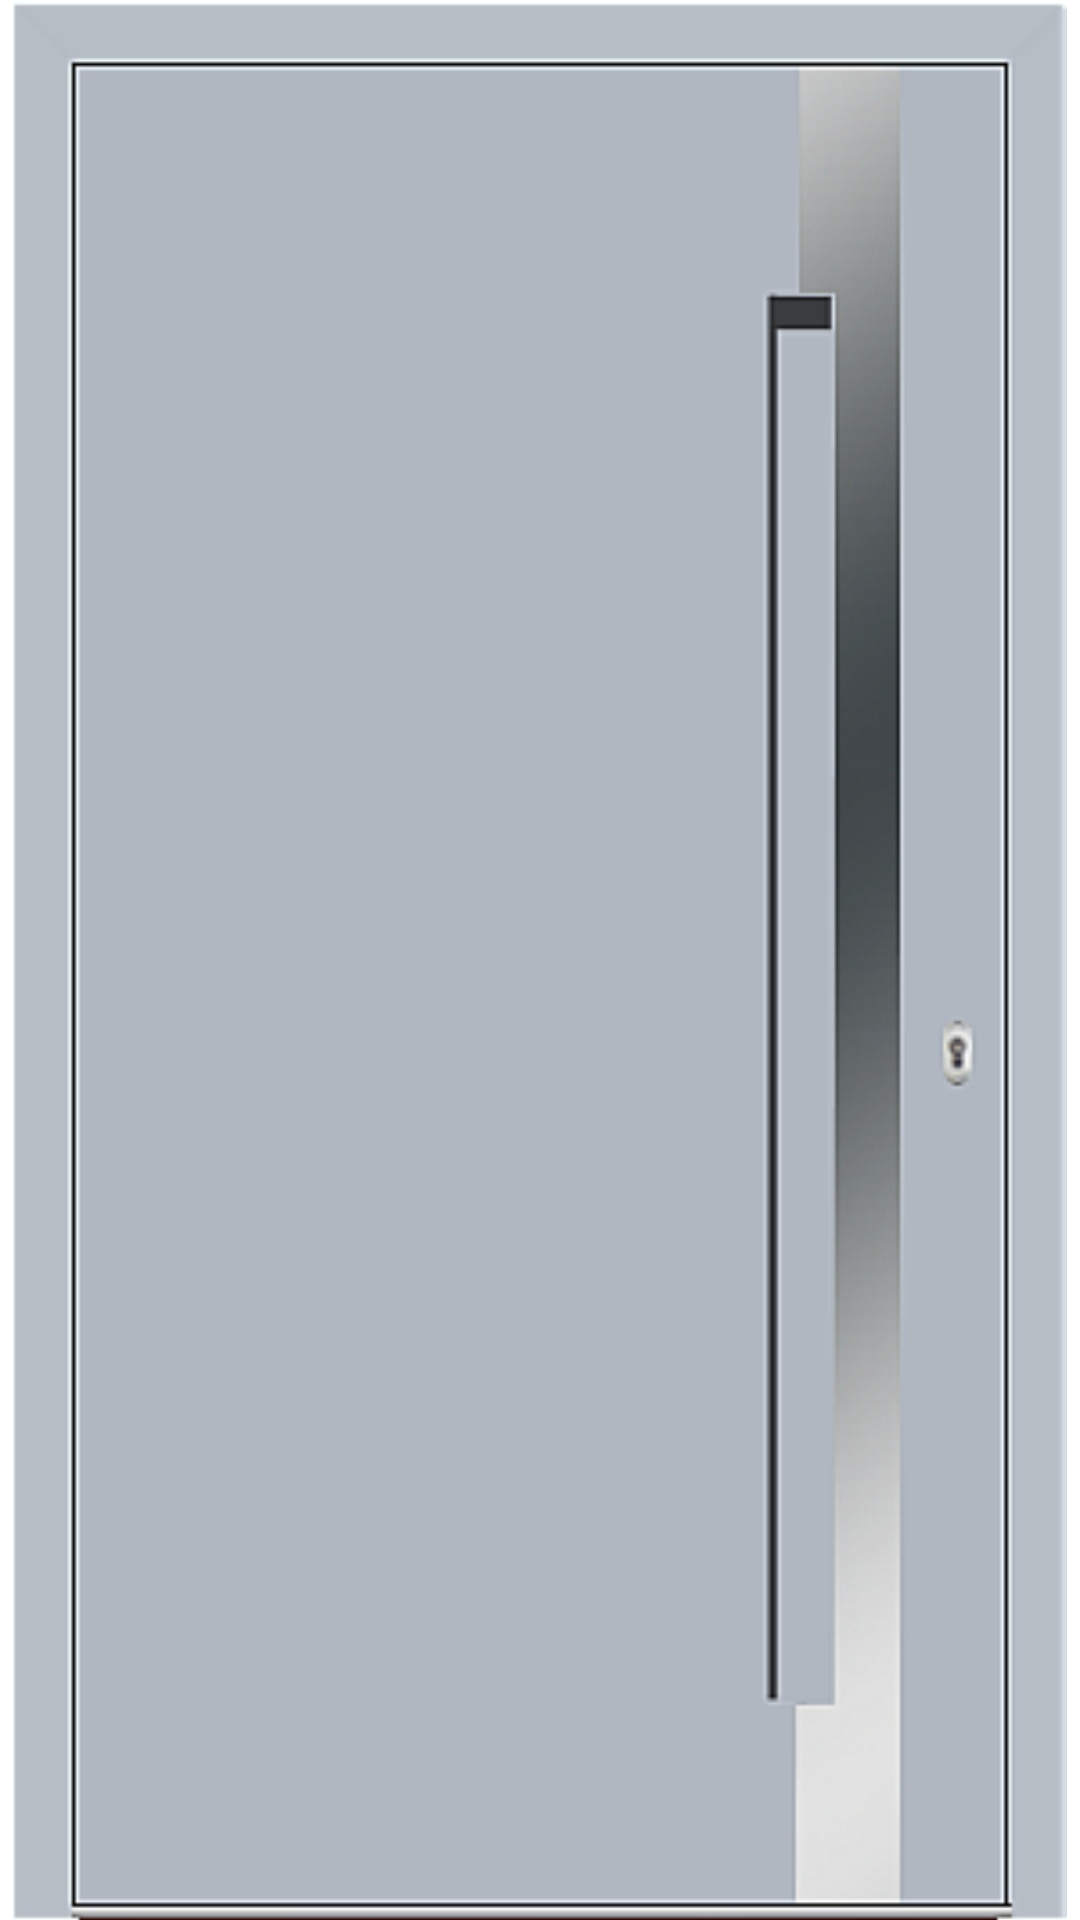 Aluminium Haustür Modell 6974-40 silbergrau